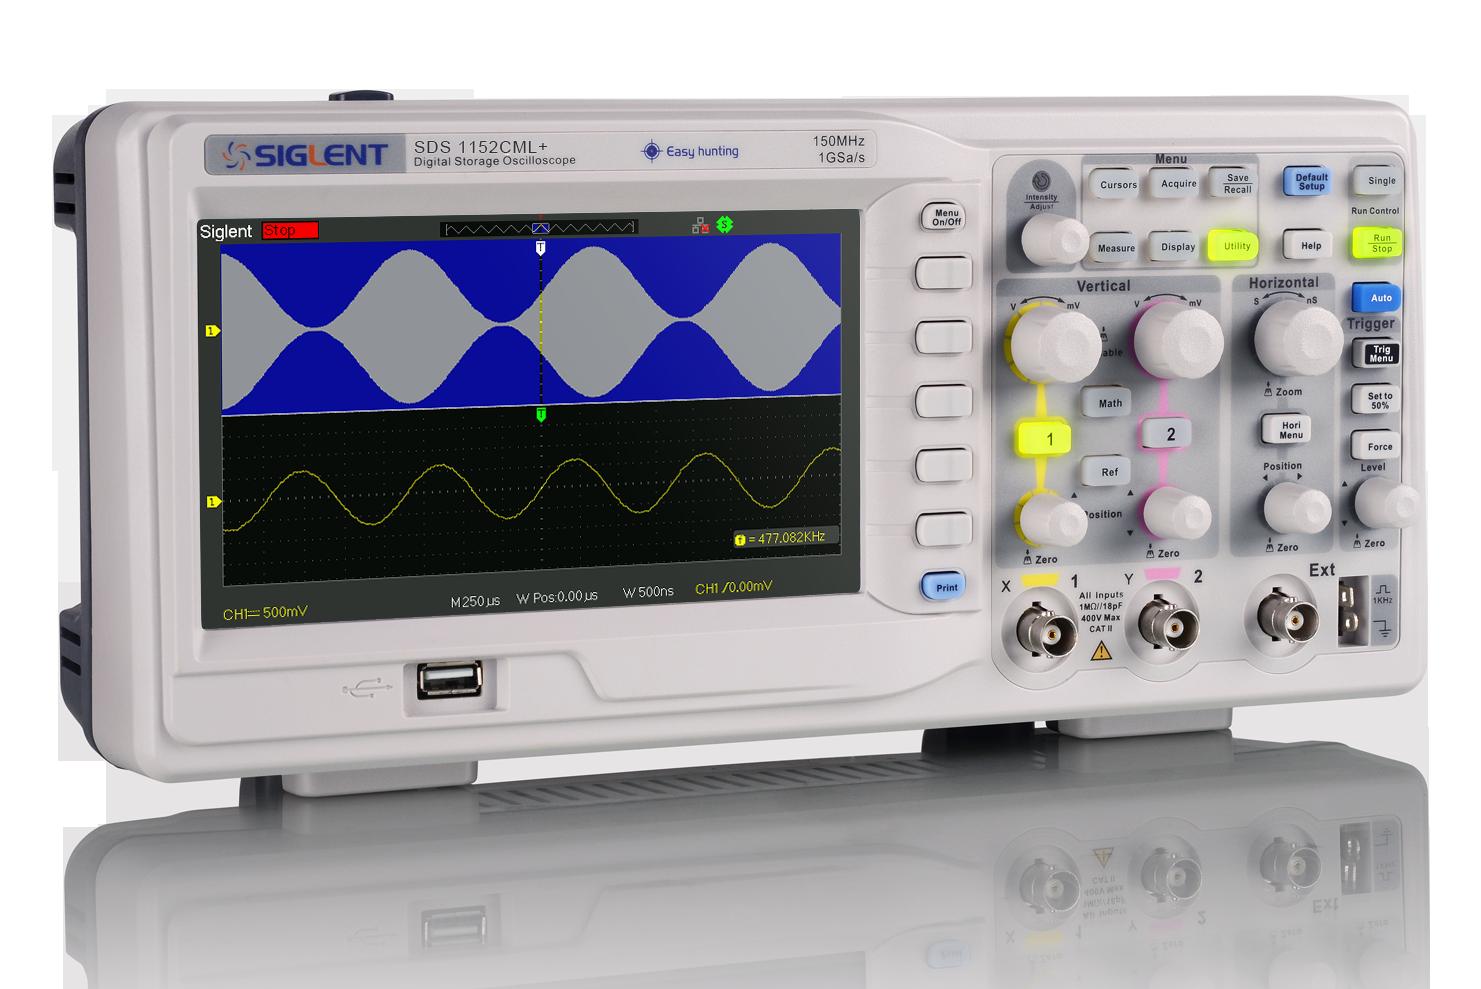 Digital Storage Oscilloscope 100 MHz Siglent Technologies SDS1102CML